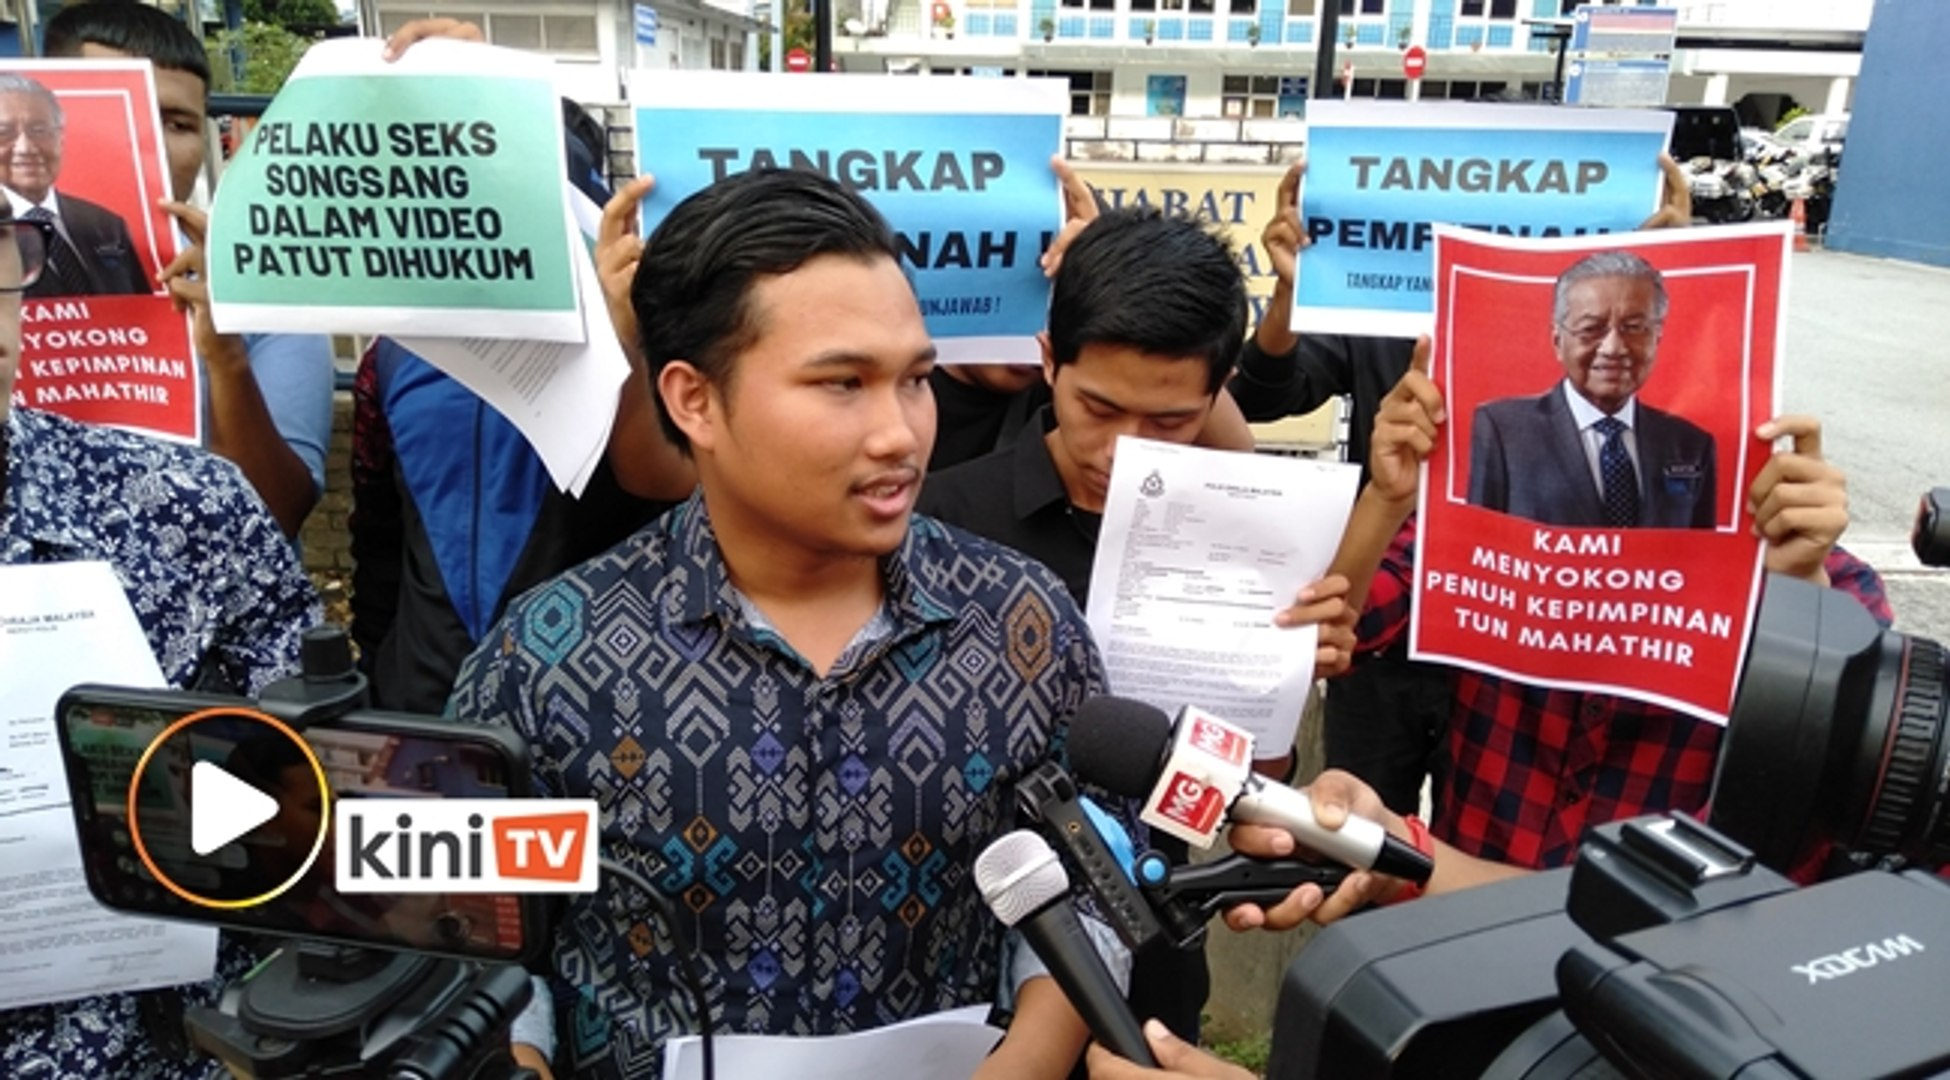 NGO lapor polis terhadap Azmin